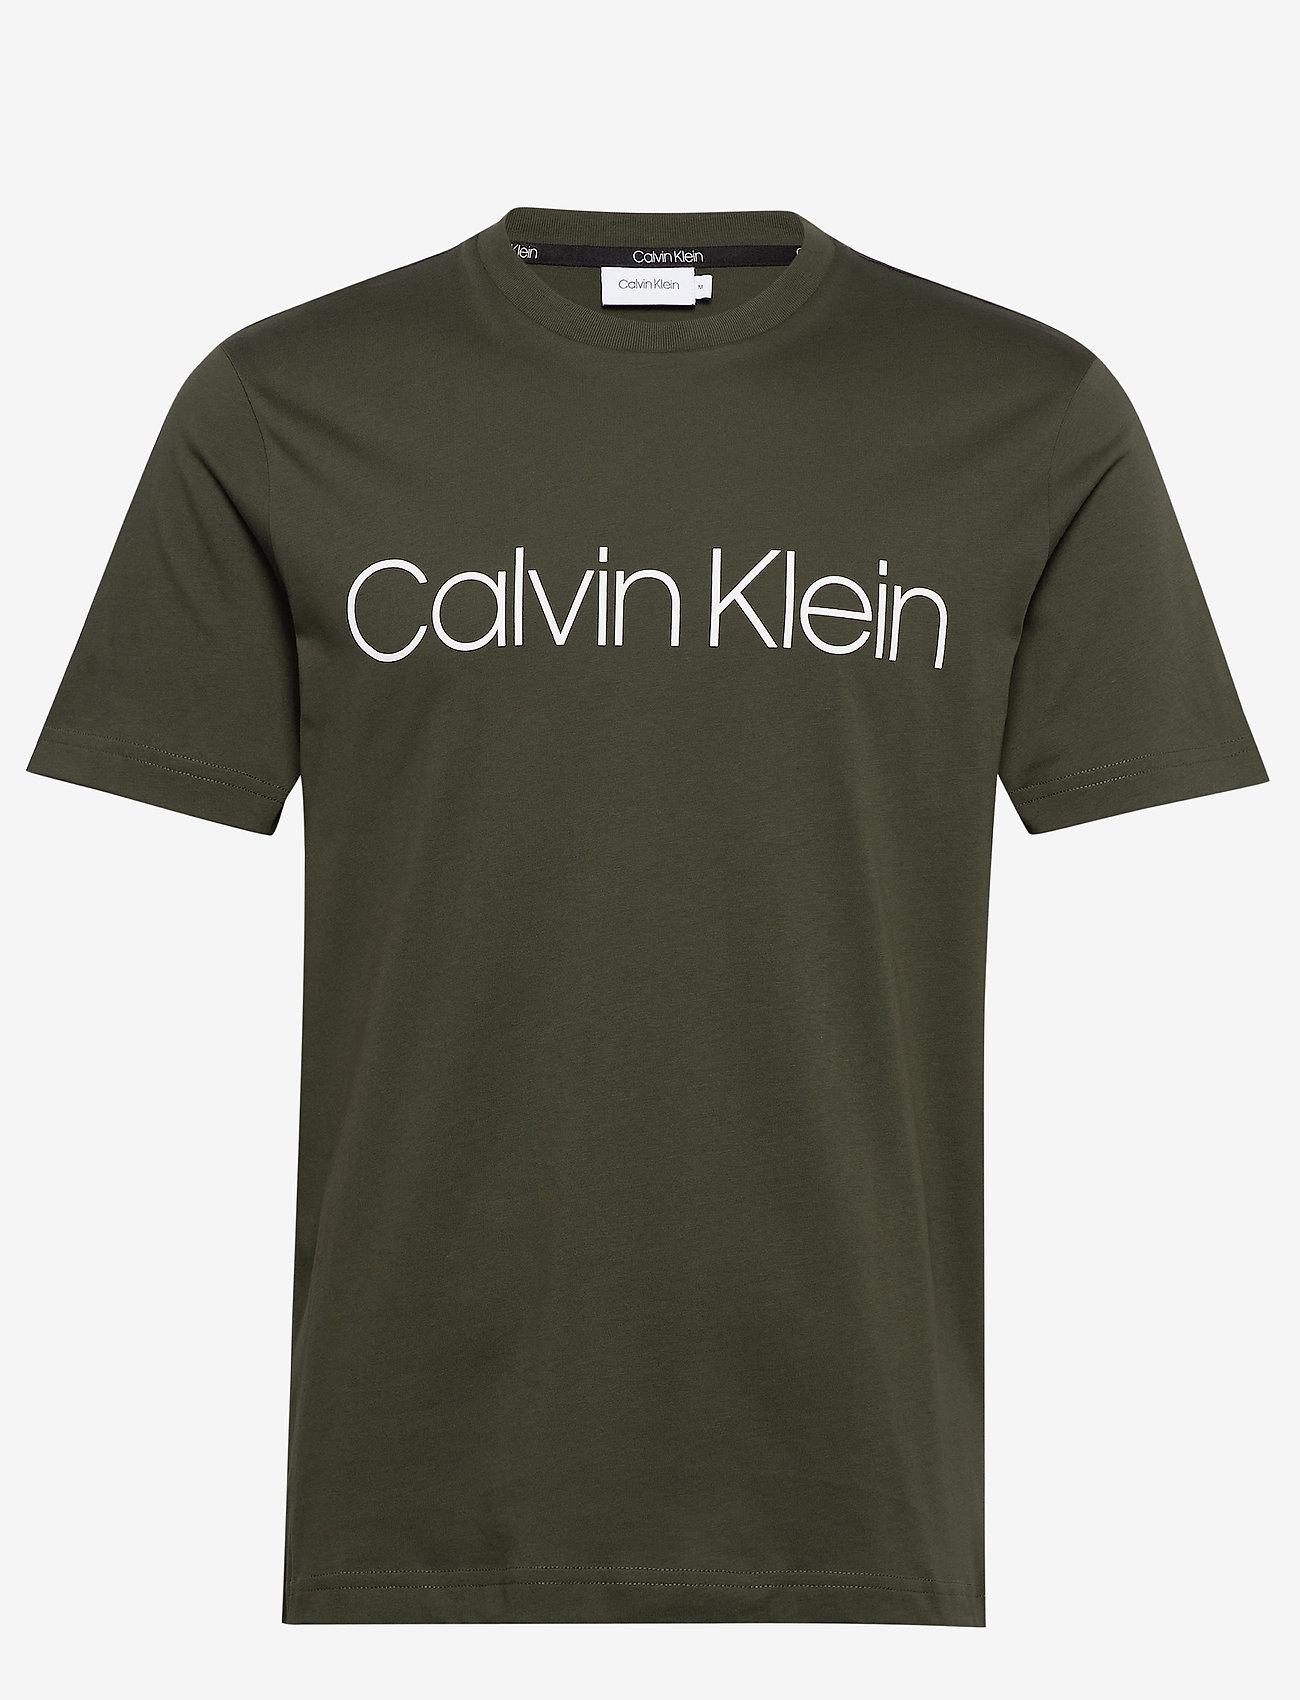 Calvin Klein - COTTON FRONT LOGO T-SHIRT - short-sleeved t-shirts - dark olive